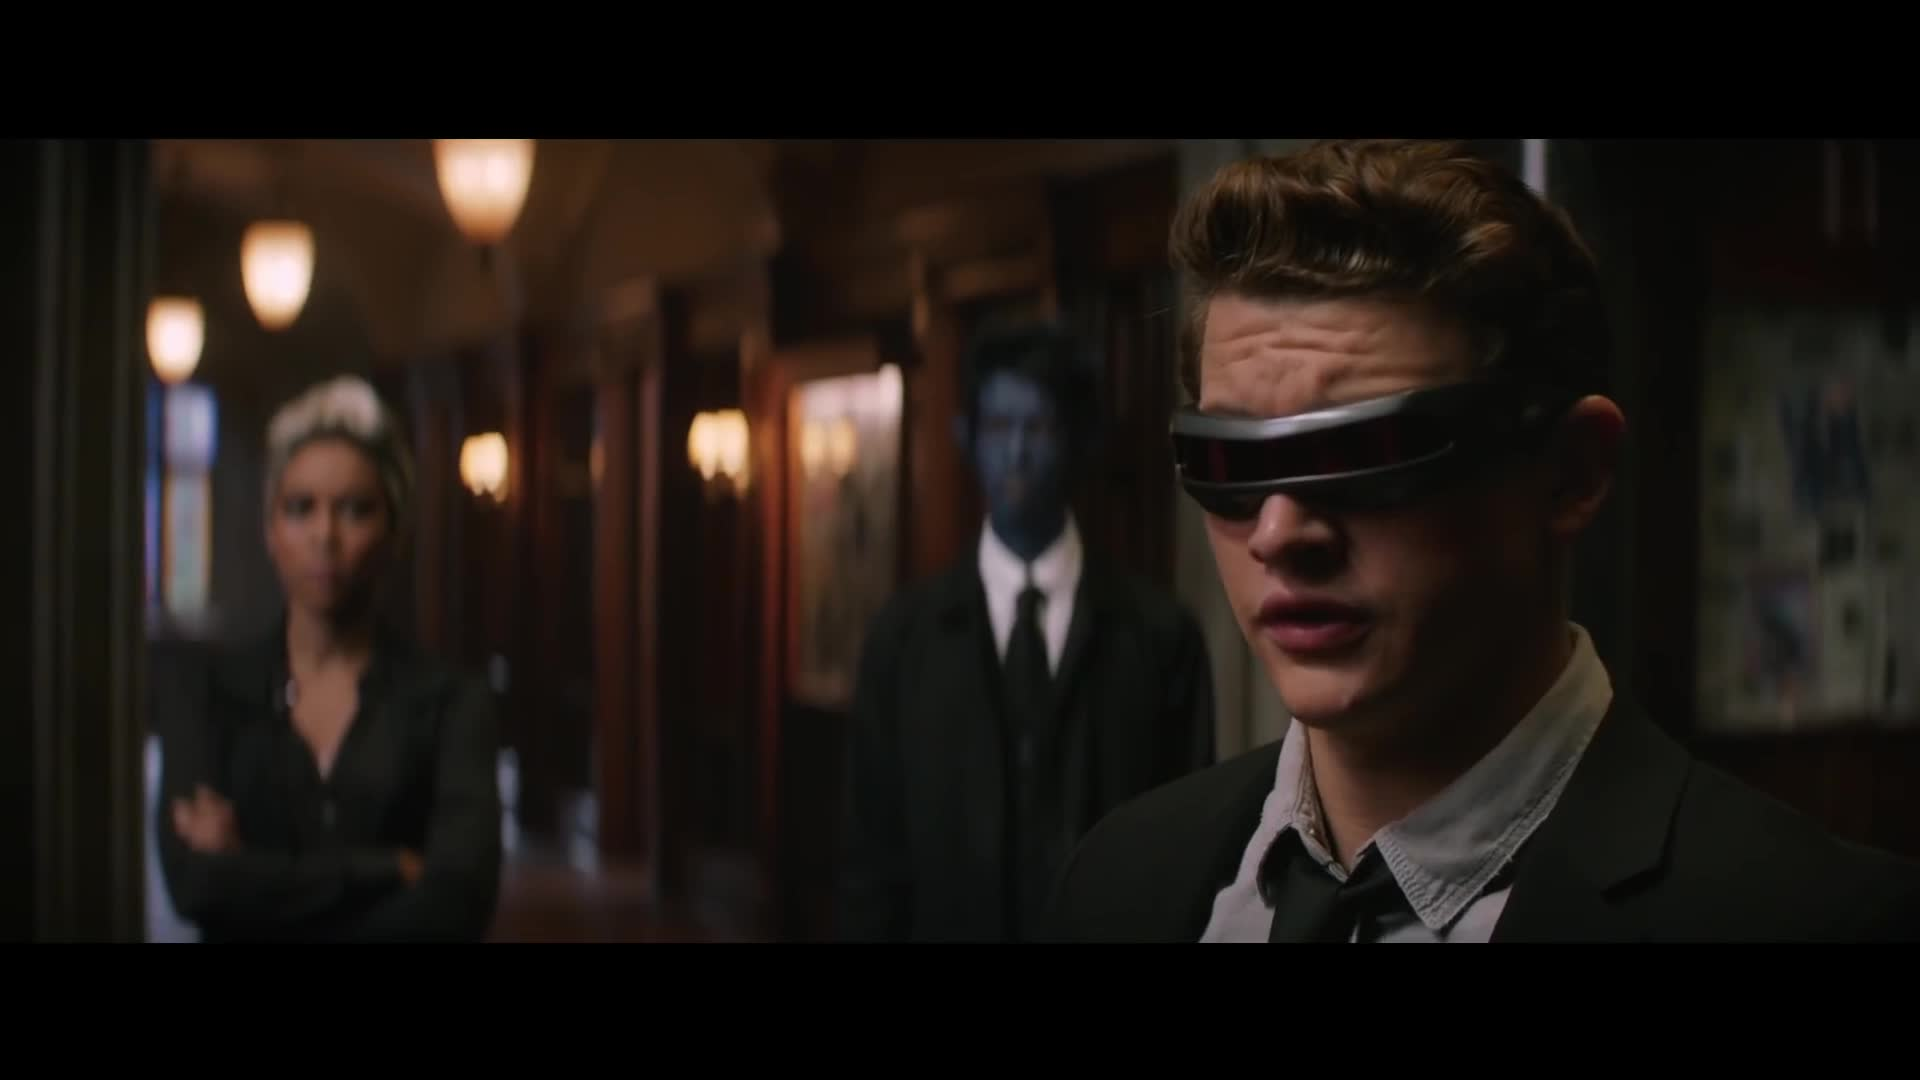 Trailer, Kino, Kinofilm, Marvel, 20th Century Fox, X-Men, X-Men: Dark Phoenix, Dark Phoenix